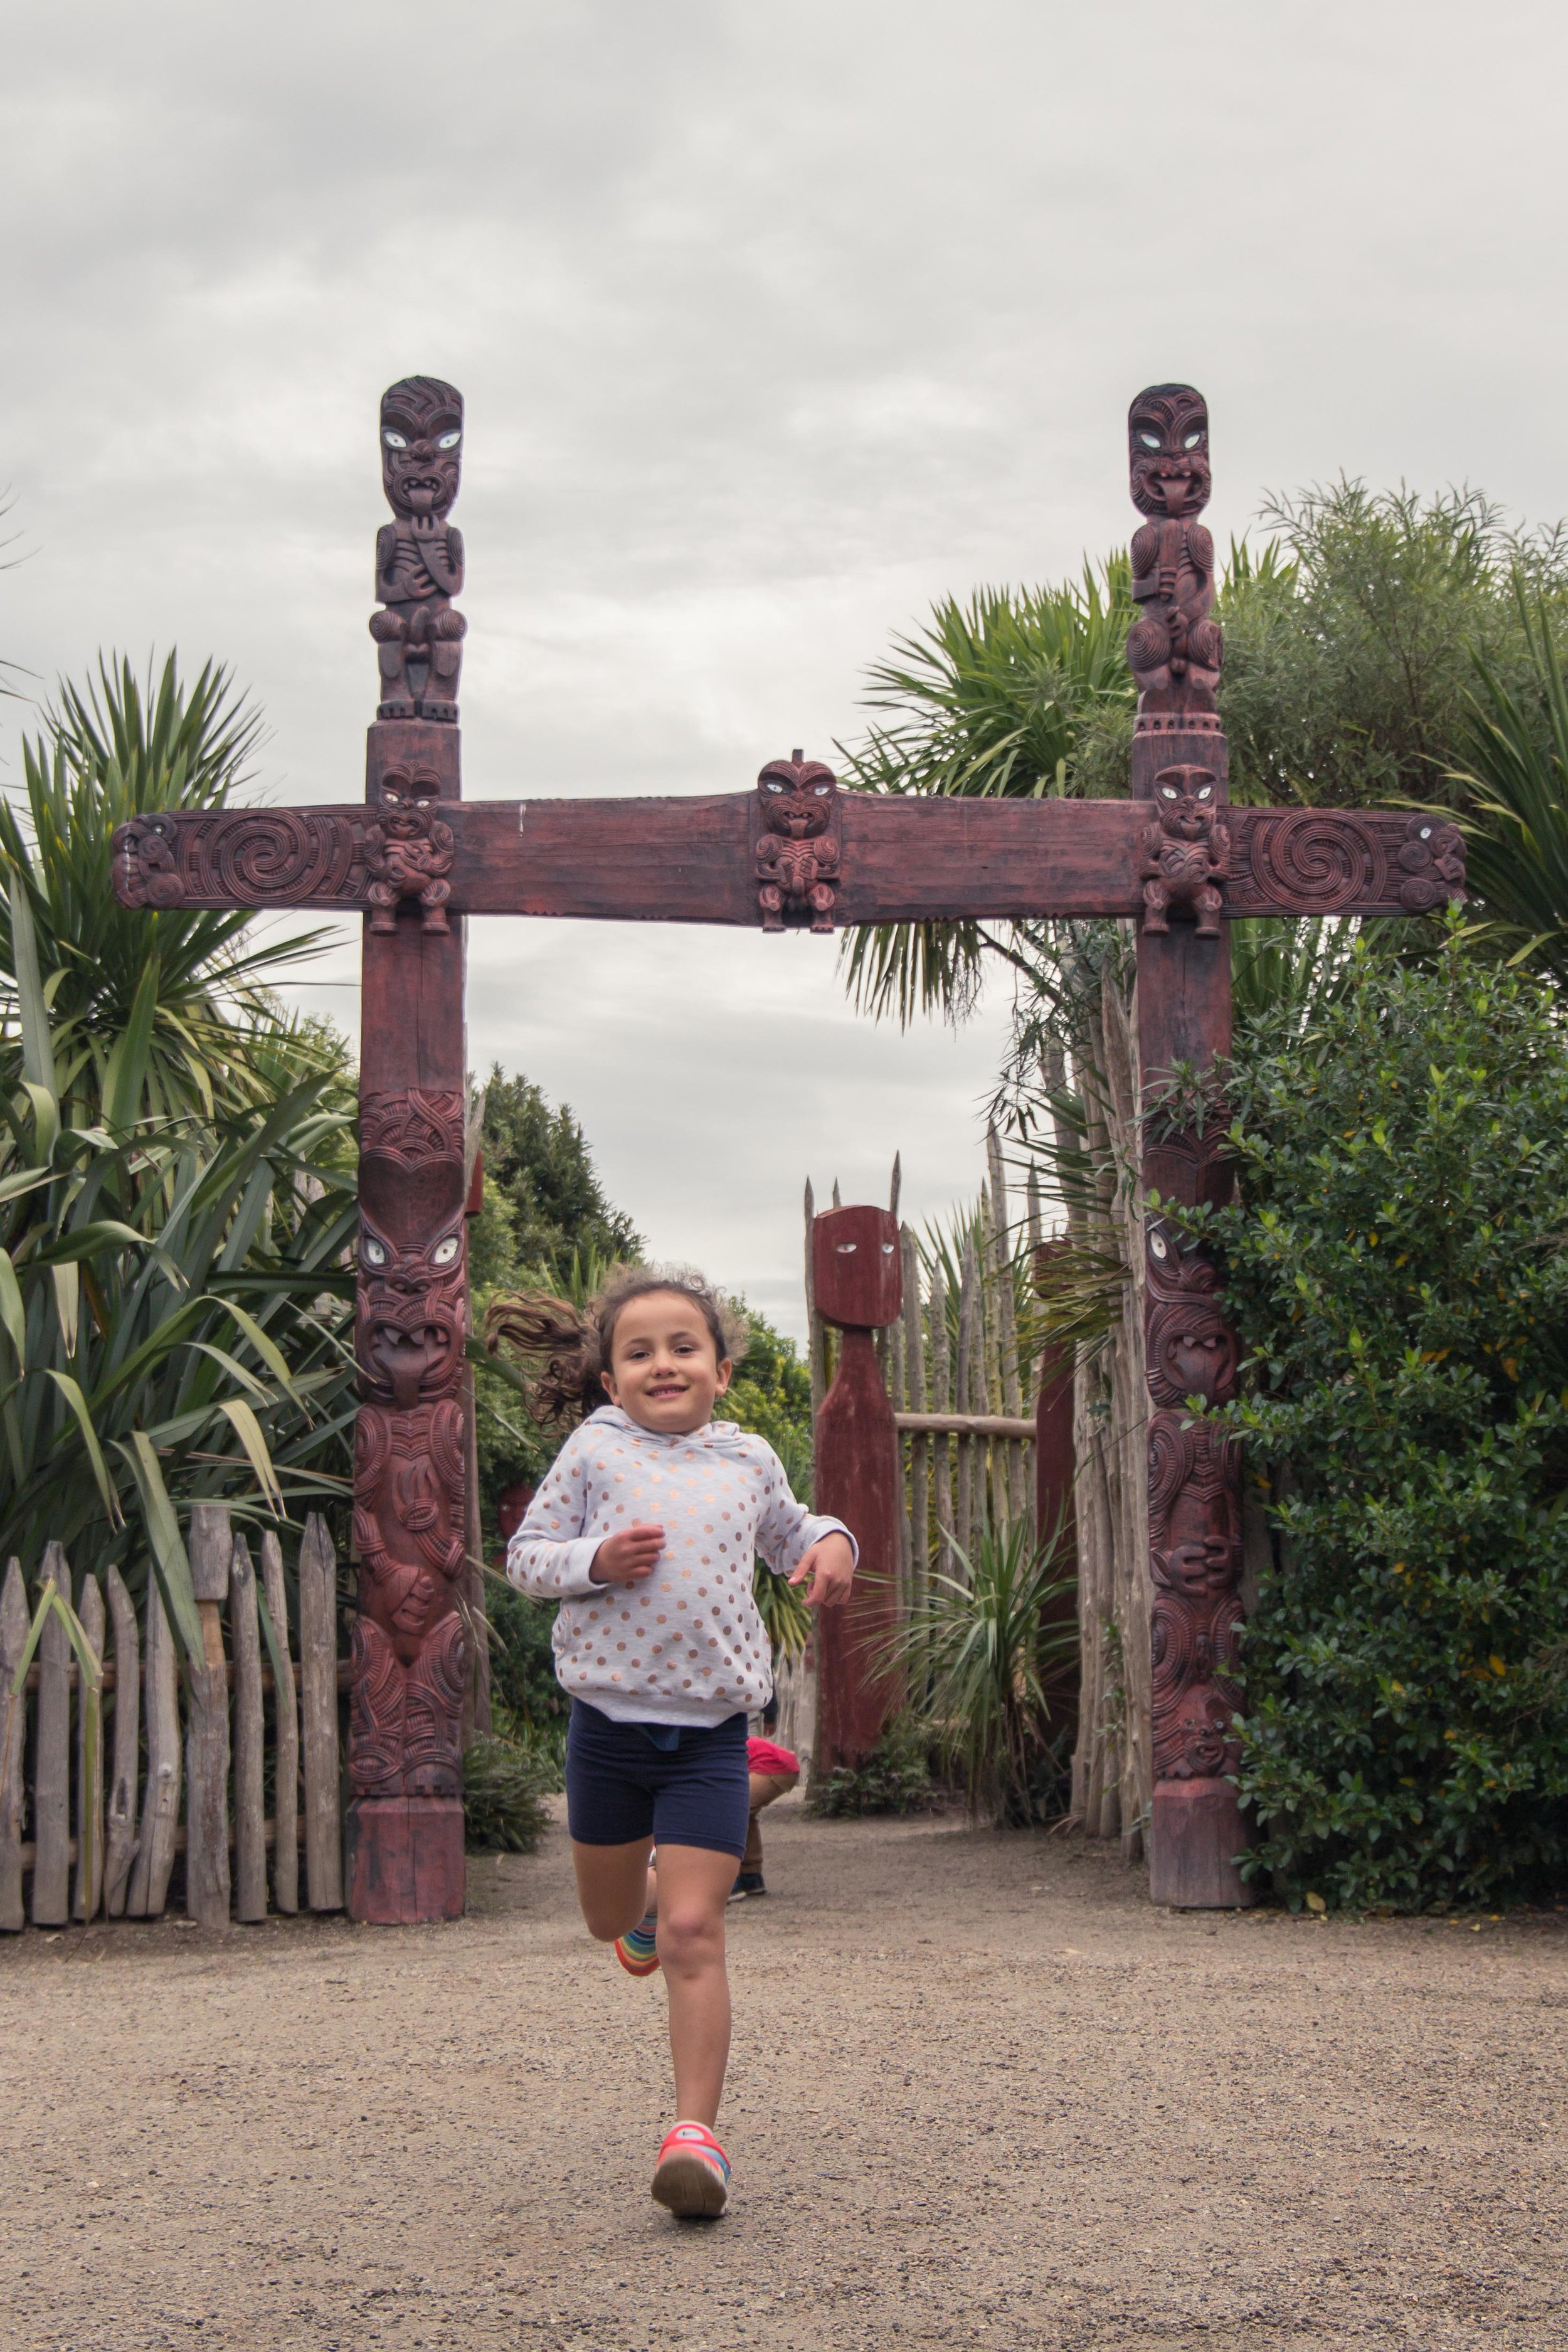 TePunaTaiao-HamiltonGardens(paths&walking)-HighRes-8011.jpg